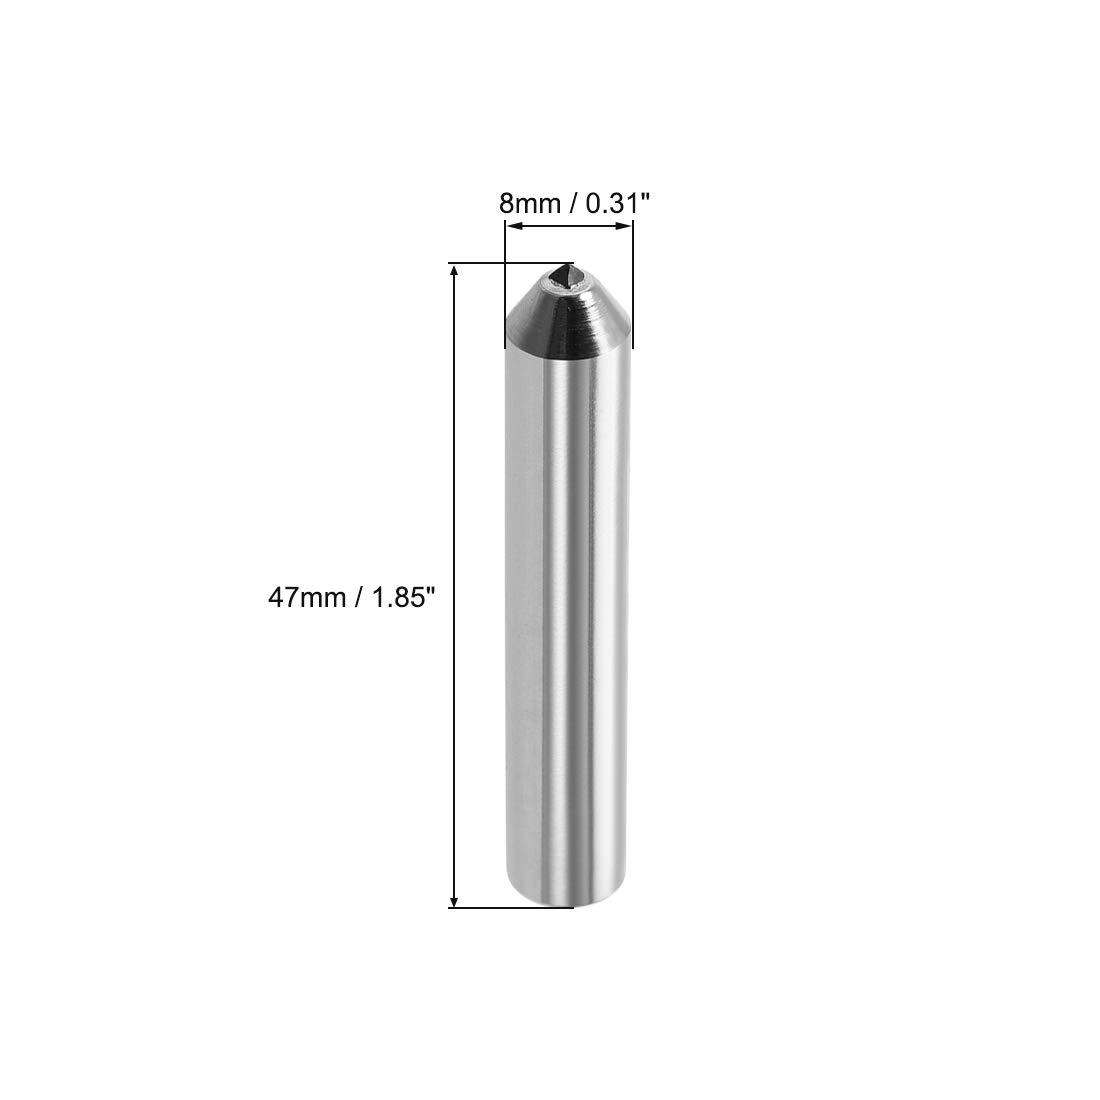 uxcell Diamond Grinding Wheel Dresser 8mm X 47mm Single Point Dressing Tool for Truing